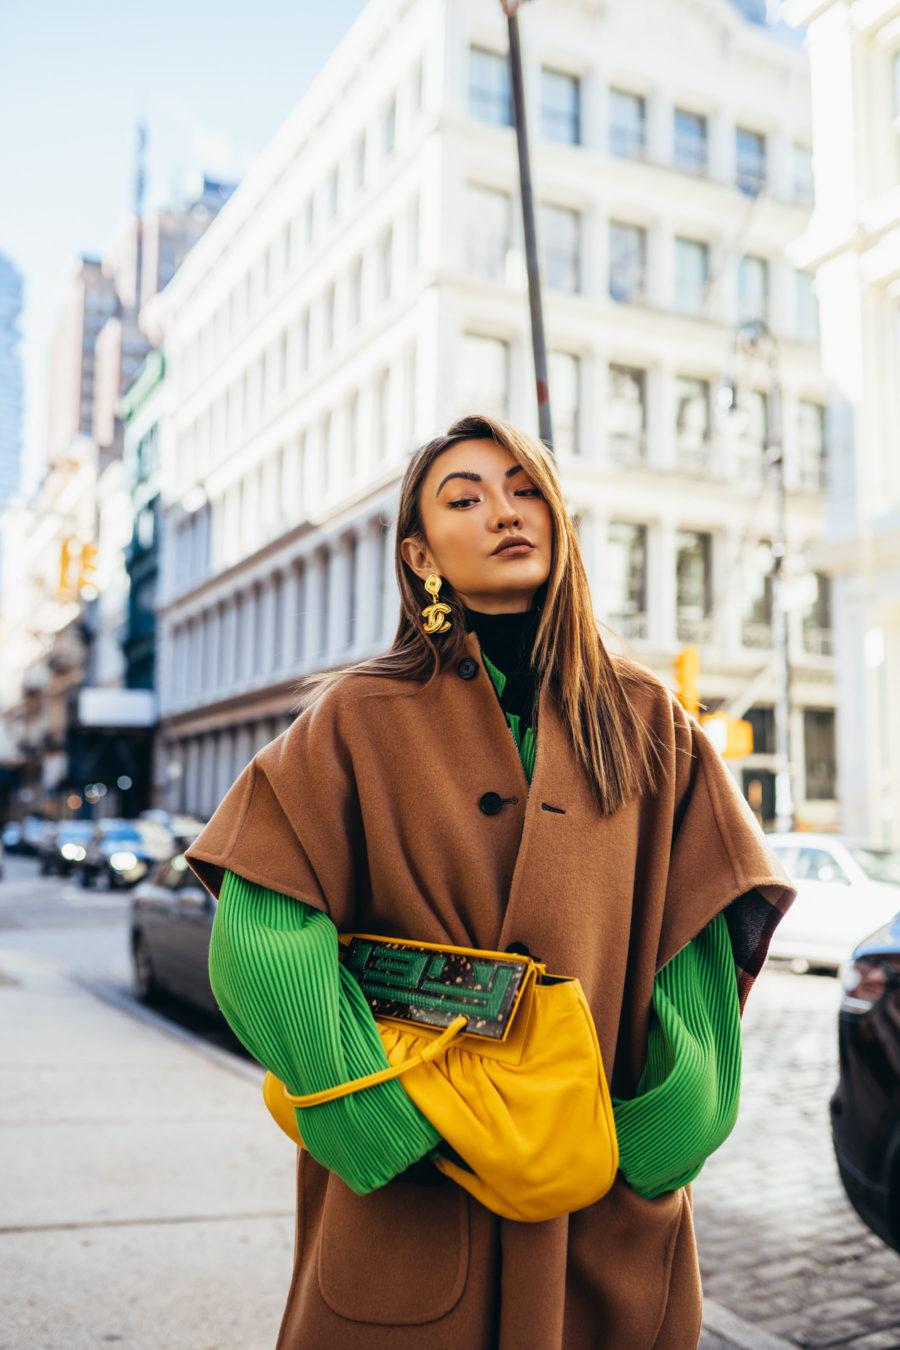 nyfw street style, nyfw spring 2019 street style, yellow snakeskin boots, burberry poncho // notjessfashion.com